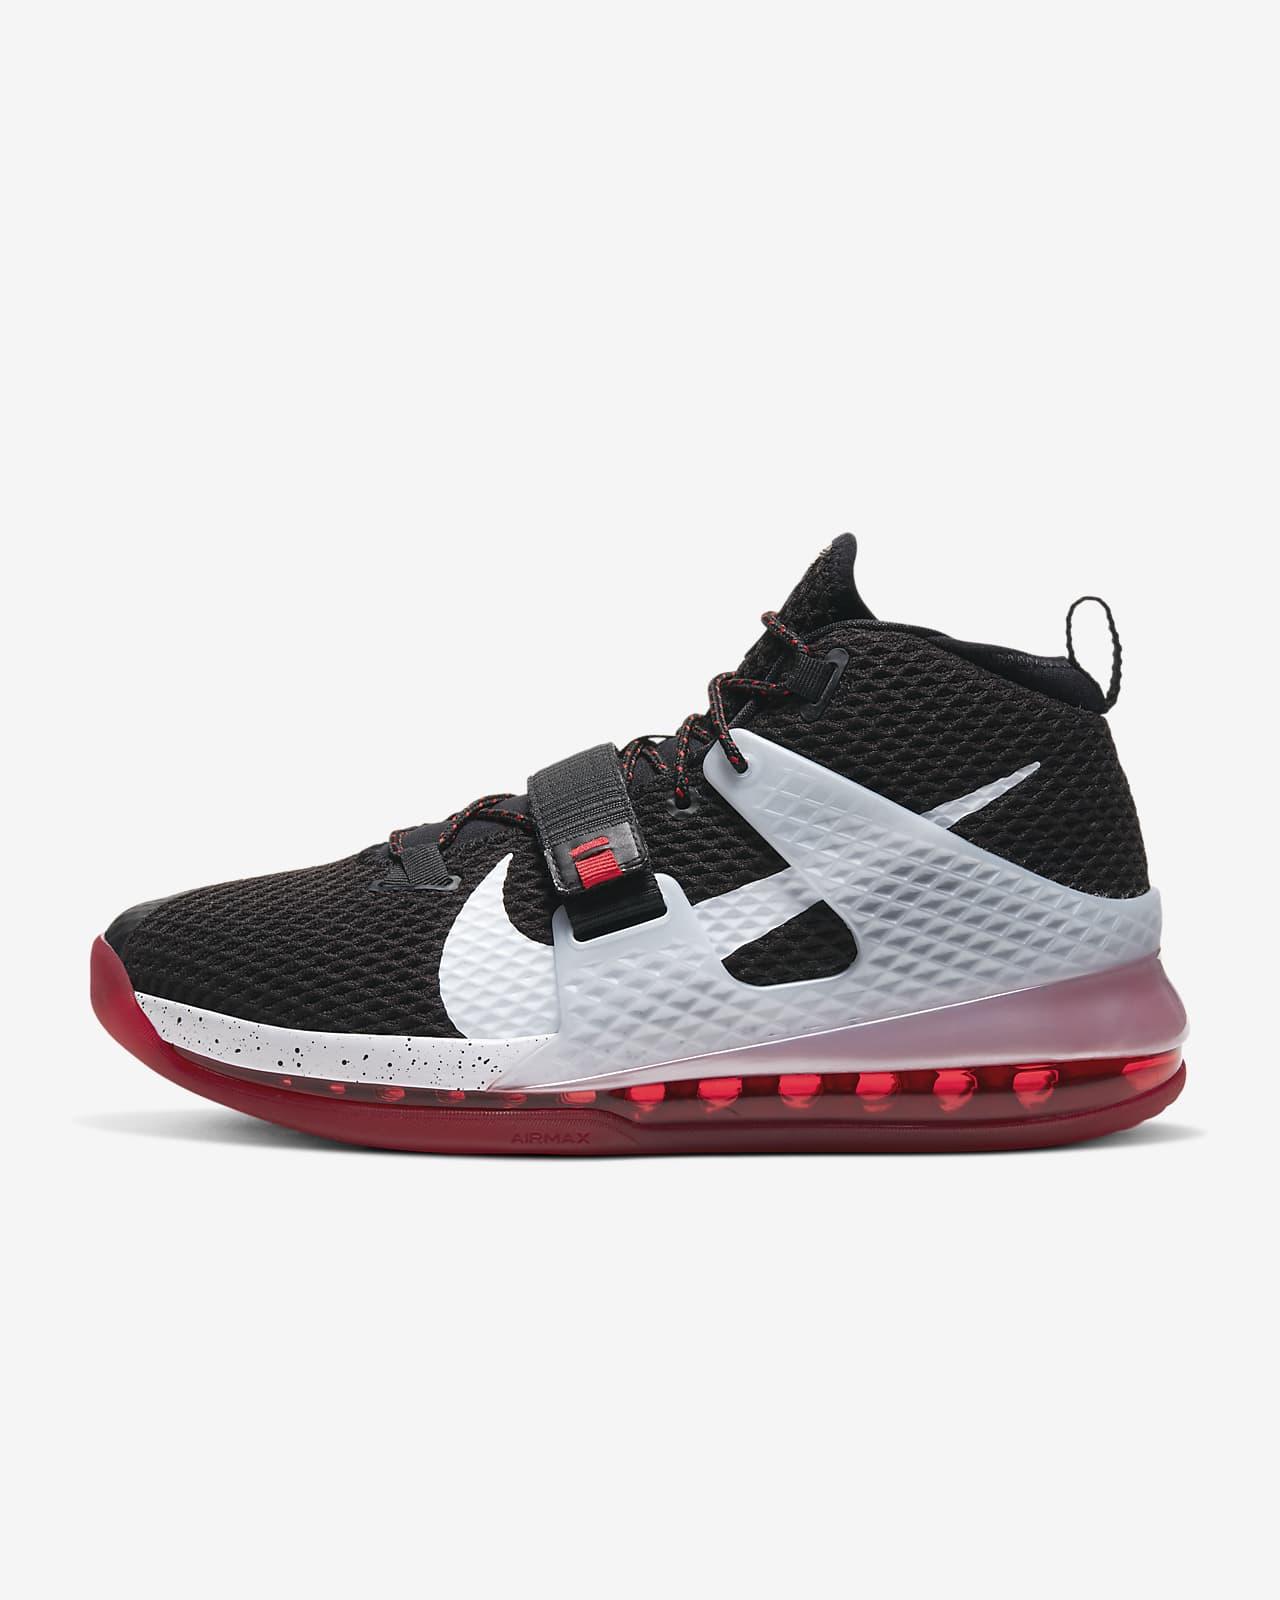 nike air force zapatos baloncesto